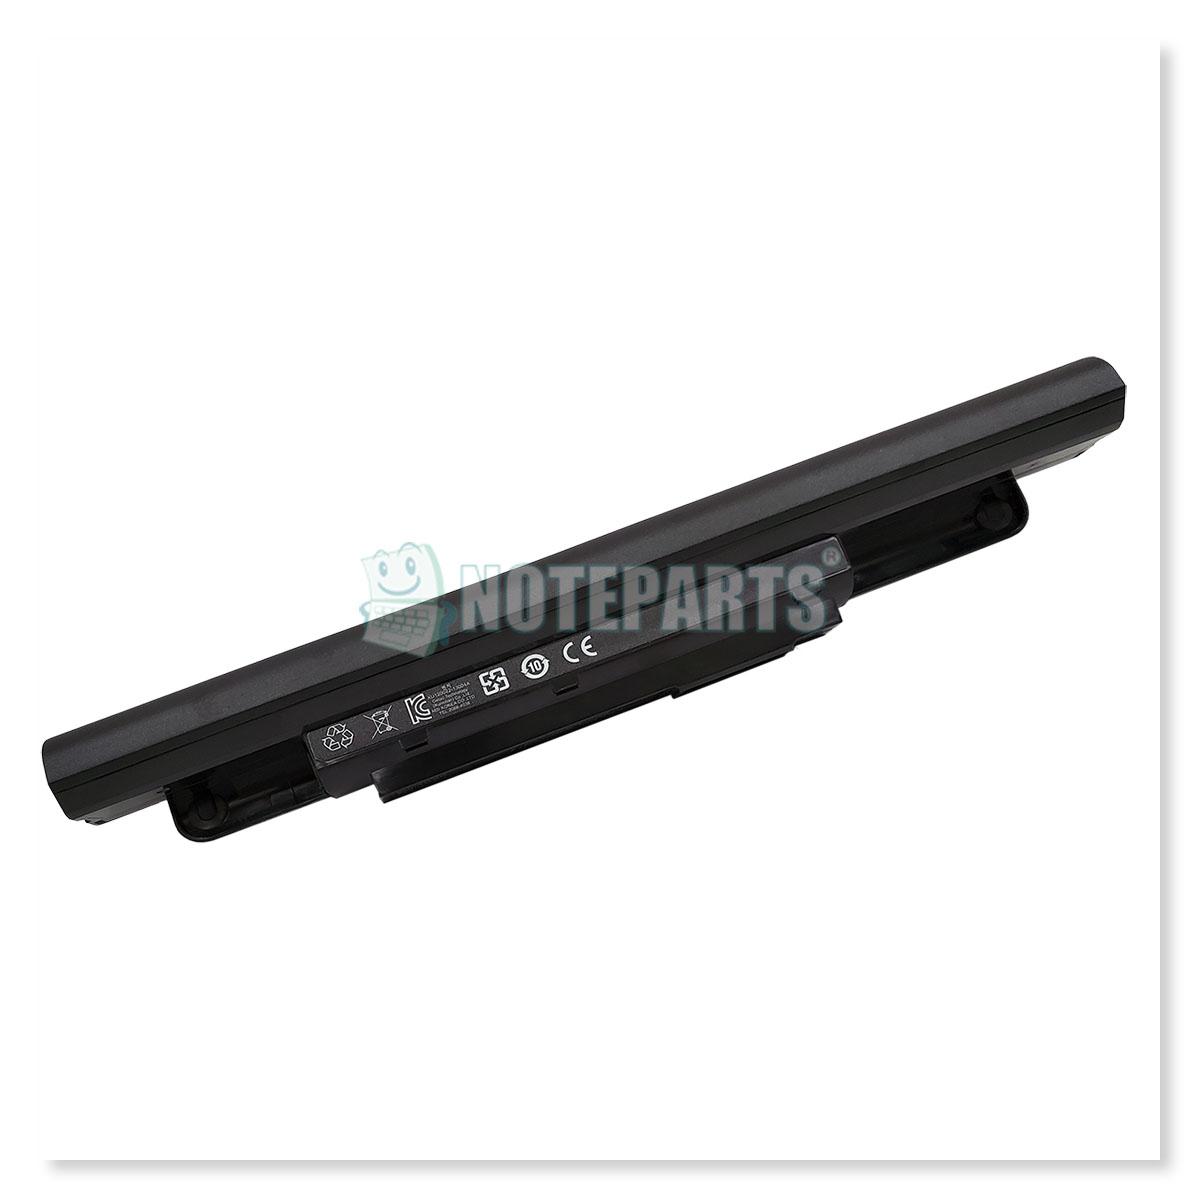 MSI X460 X460-051JP Dospara ドスパラ Critea VH-AD バッテリー BTY-M46